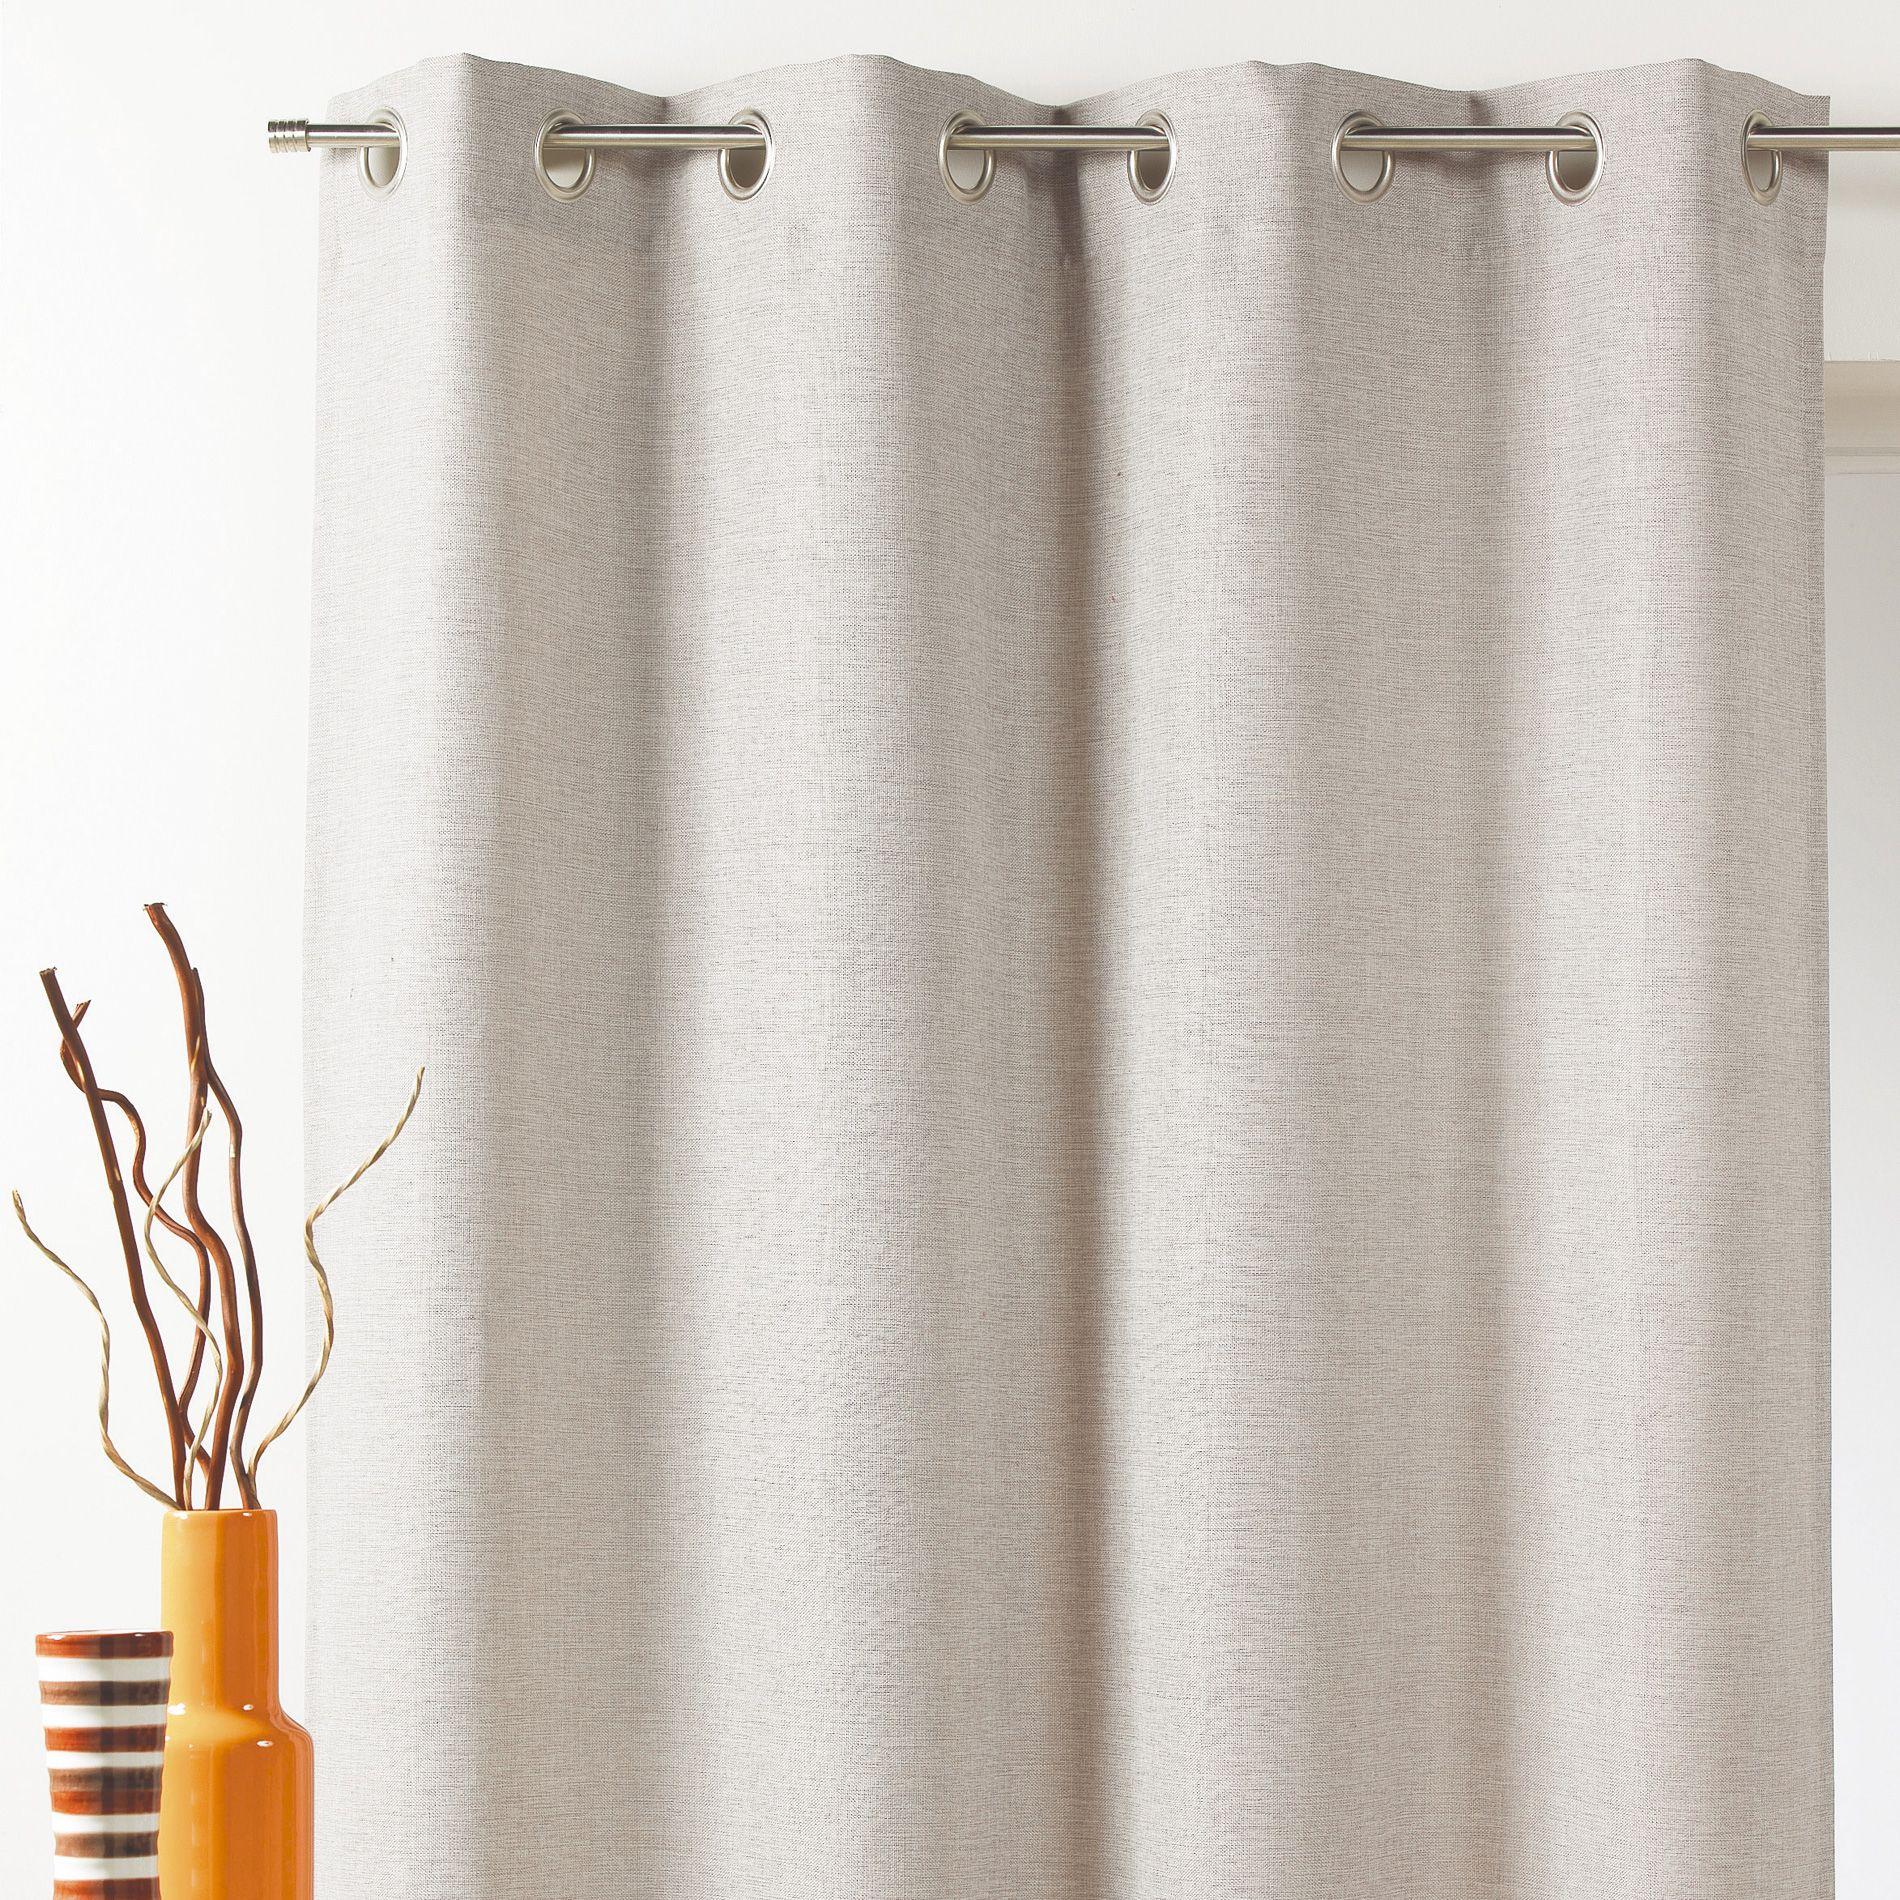 rideau occultant 140 x 260 cm faux uni lin rideau. Black Bedroom Furniture Sets. Home Design Ideas